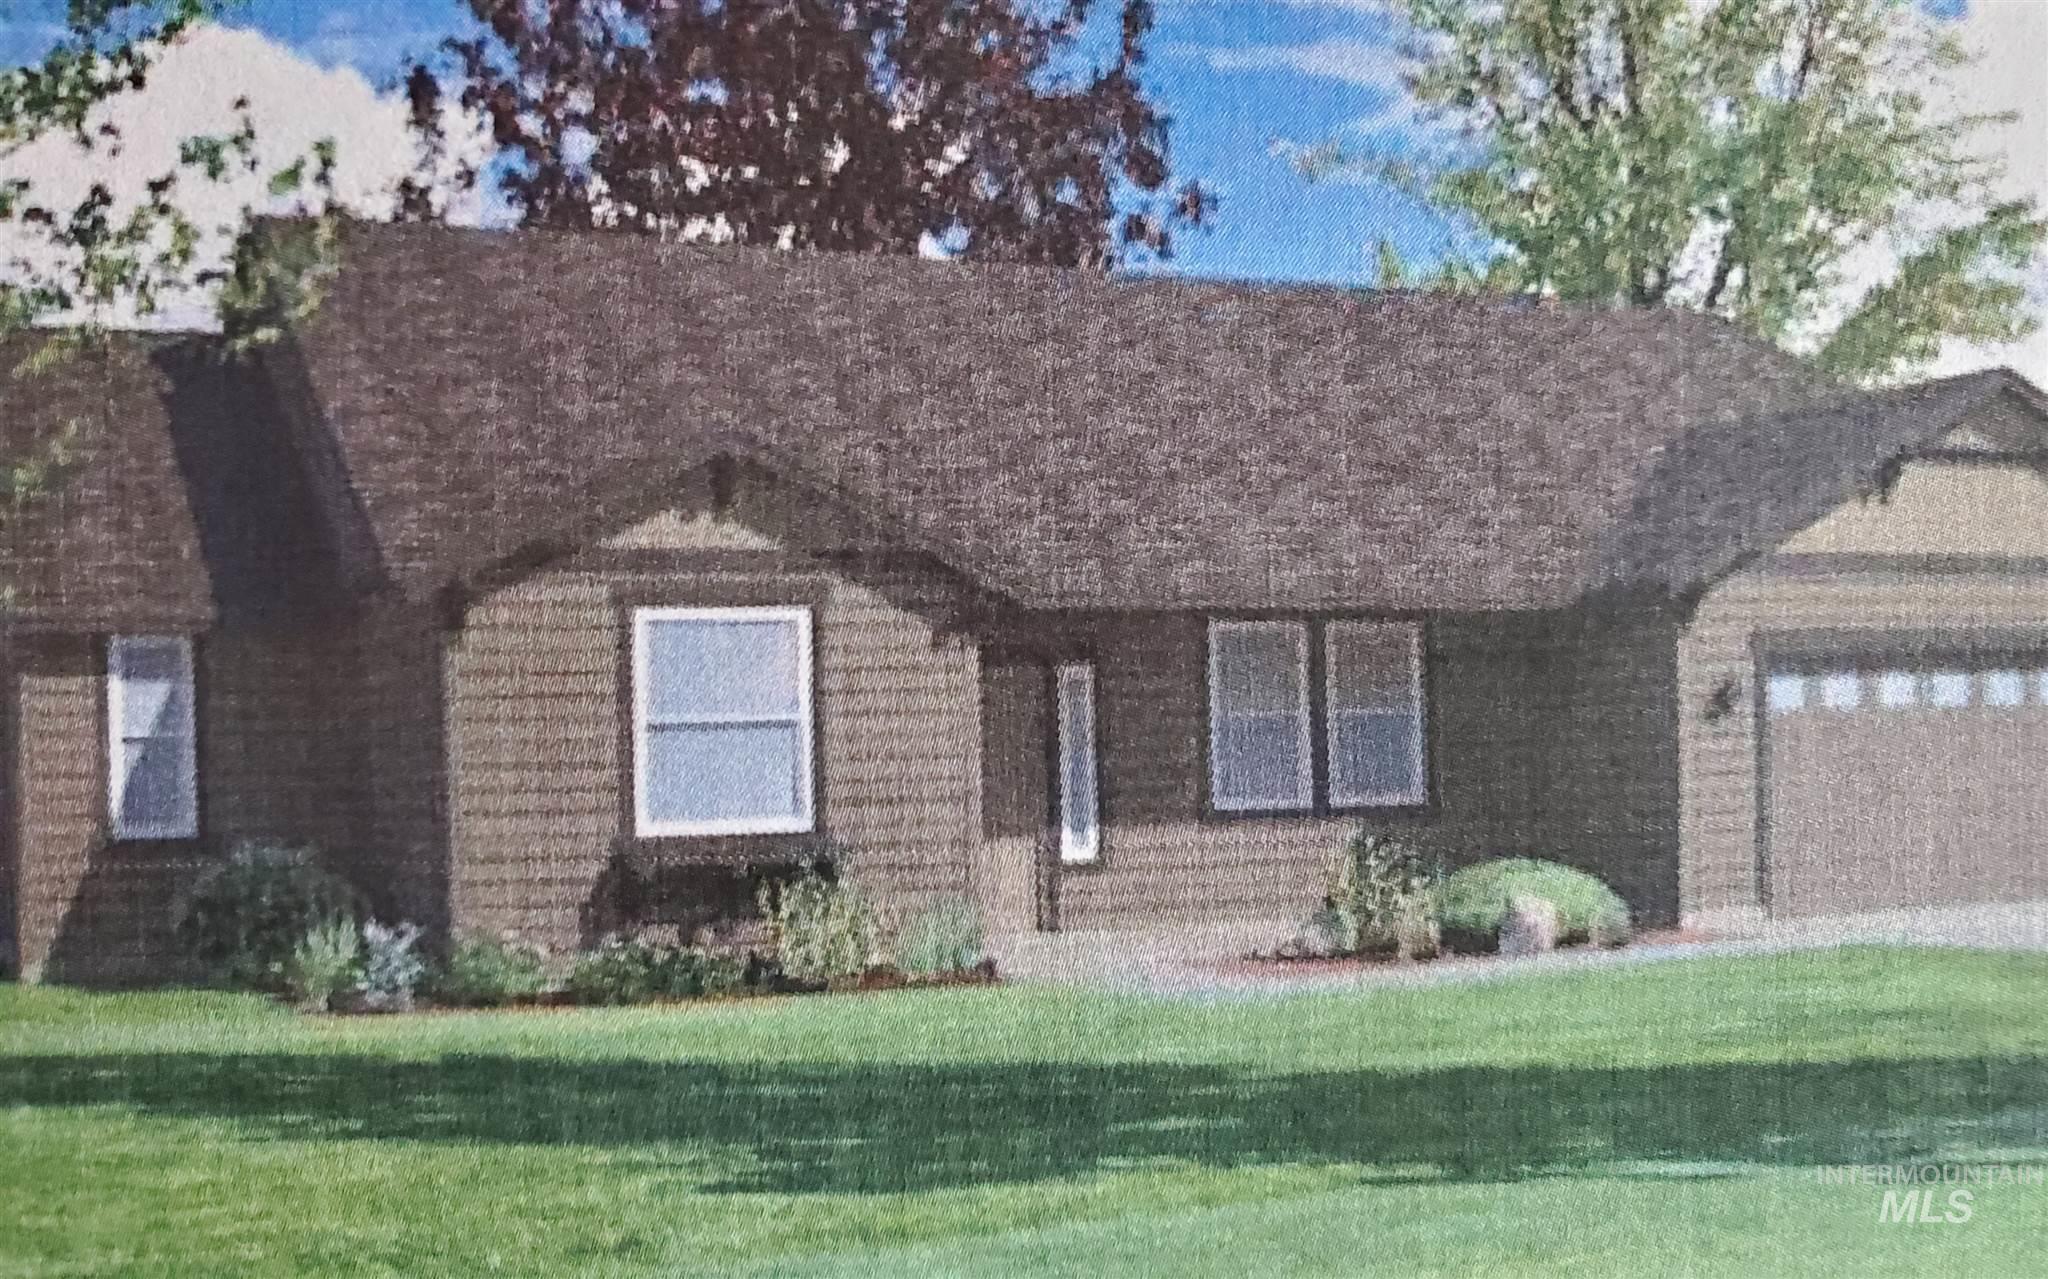 2531 Mariposa Ct Property Photo - Emmett, ID real estate listing